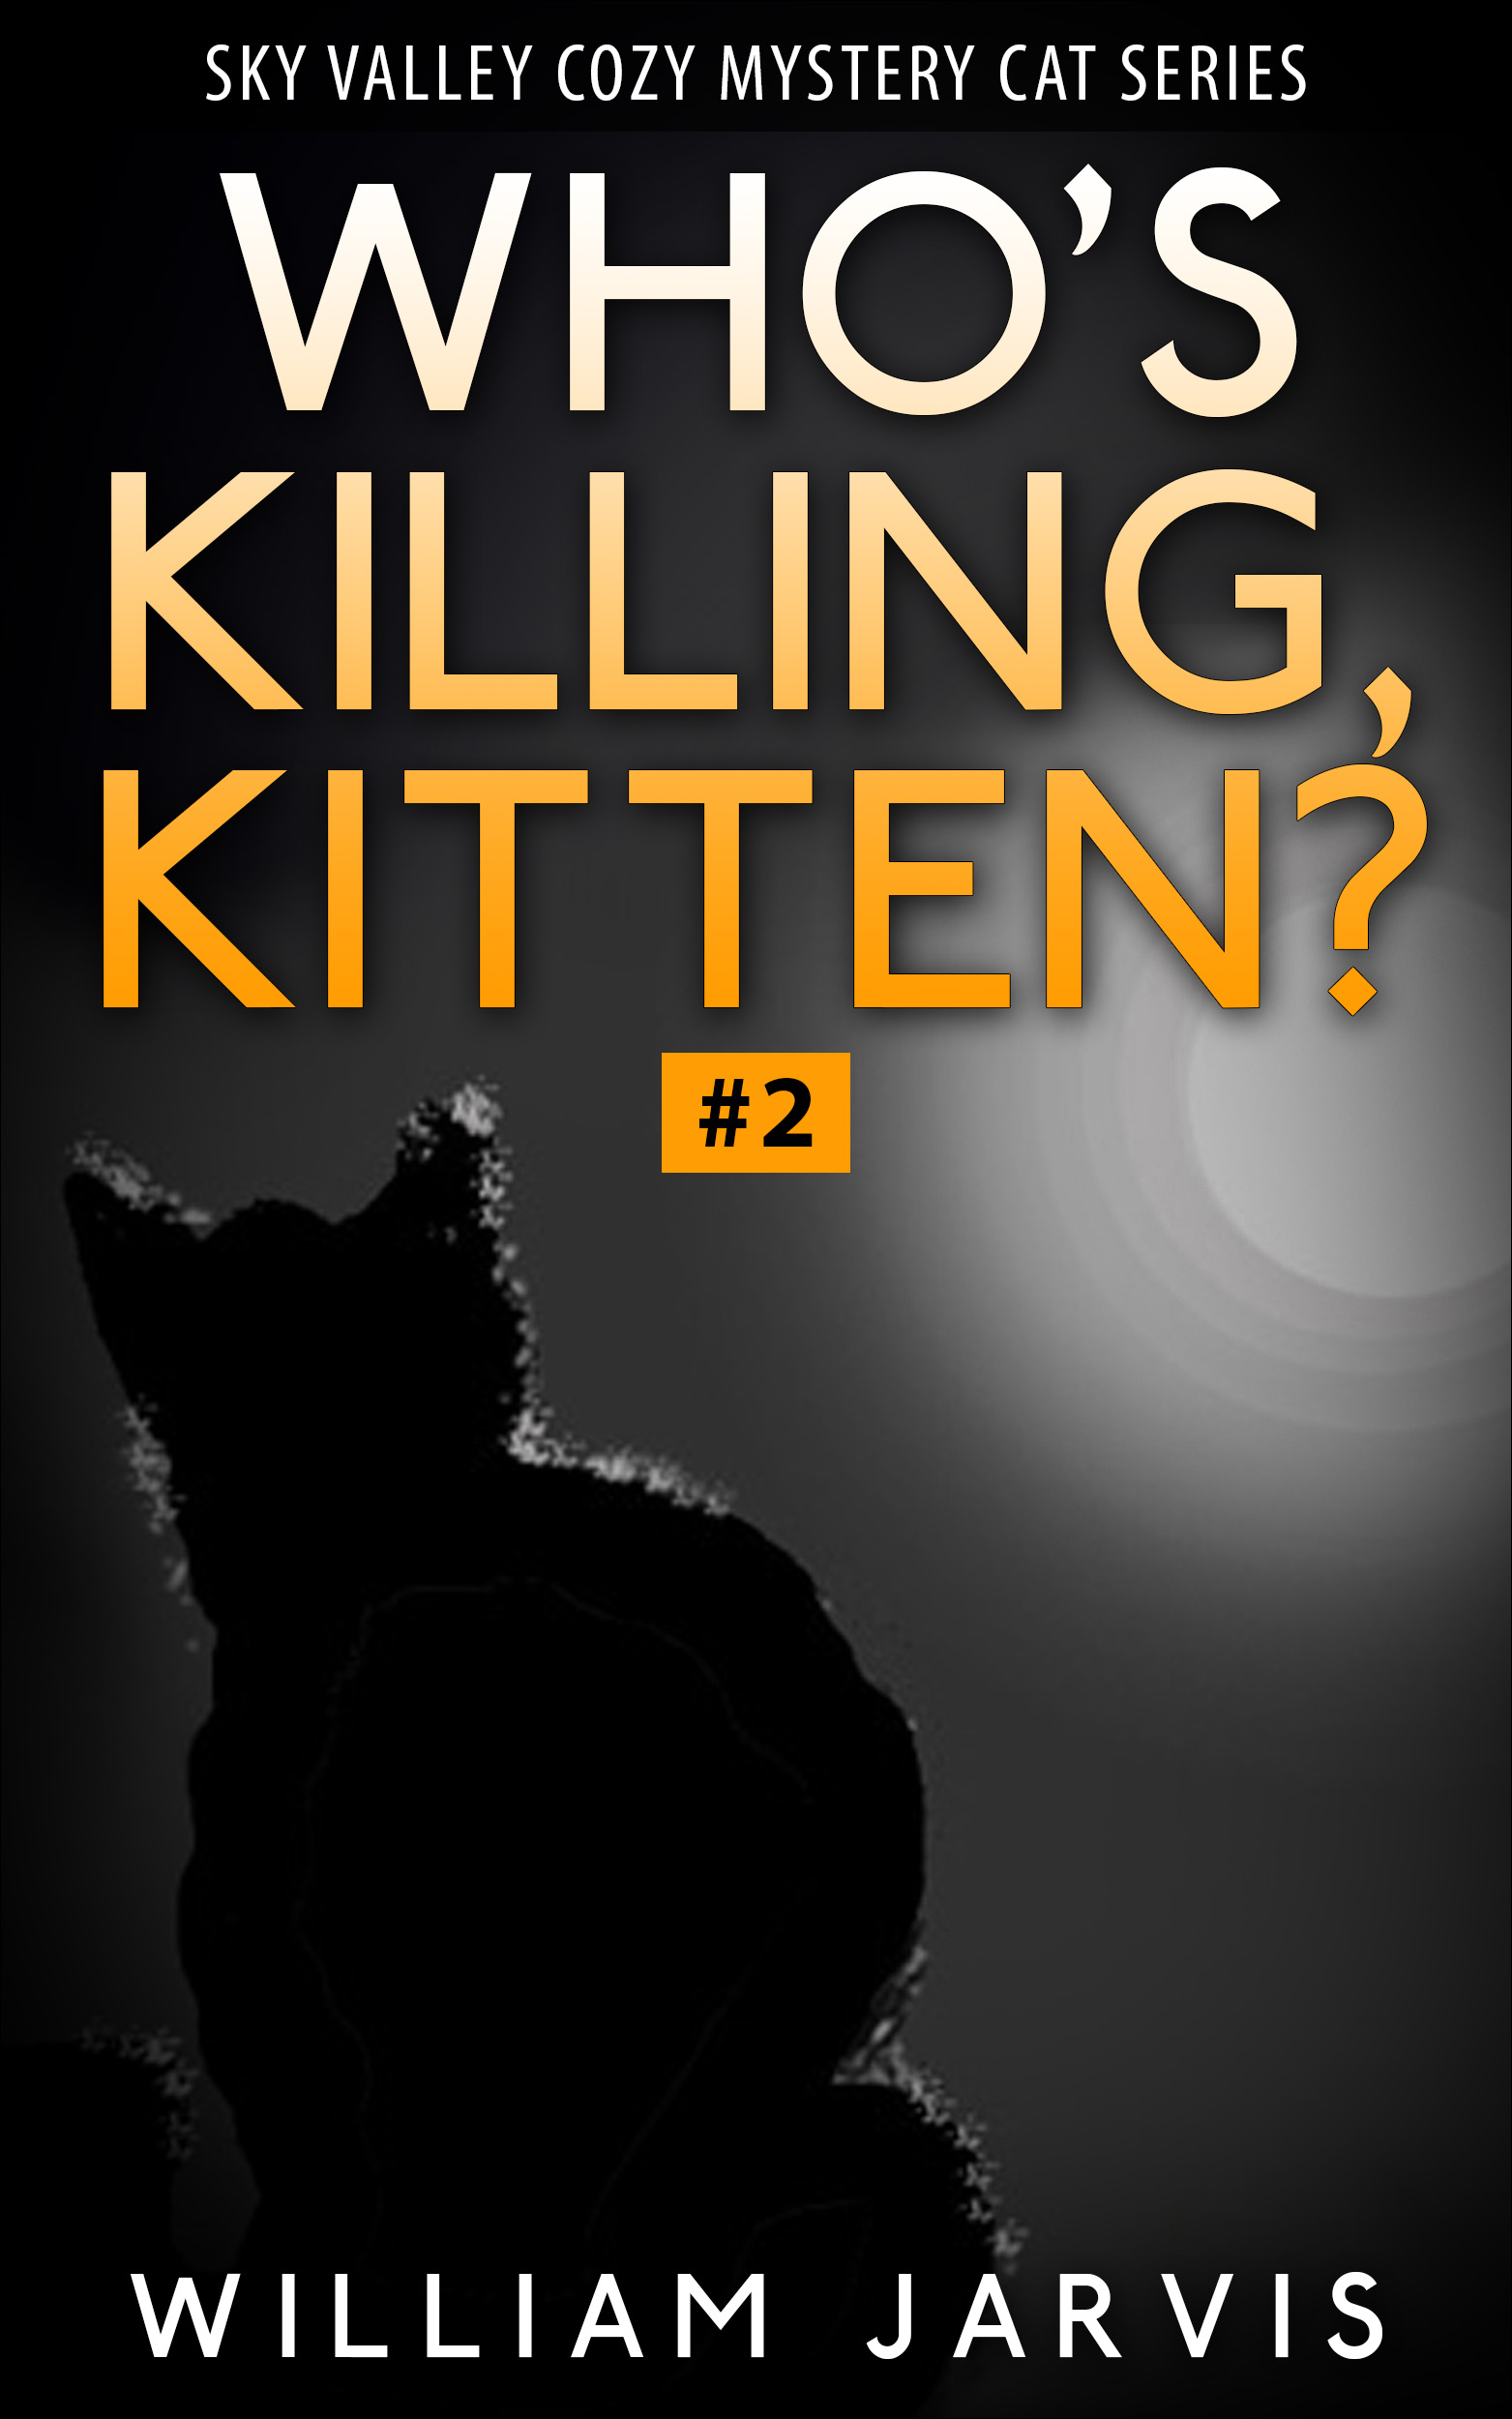 Who's killing, kitten ?